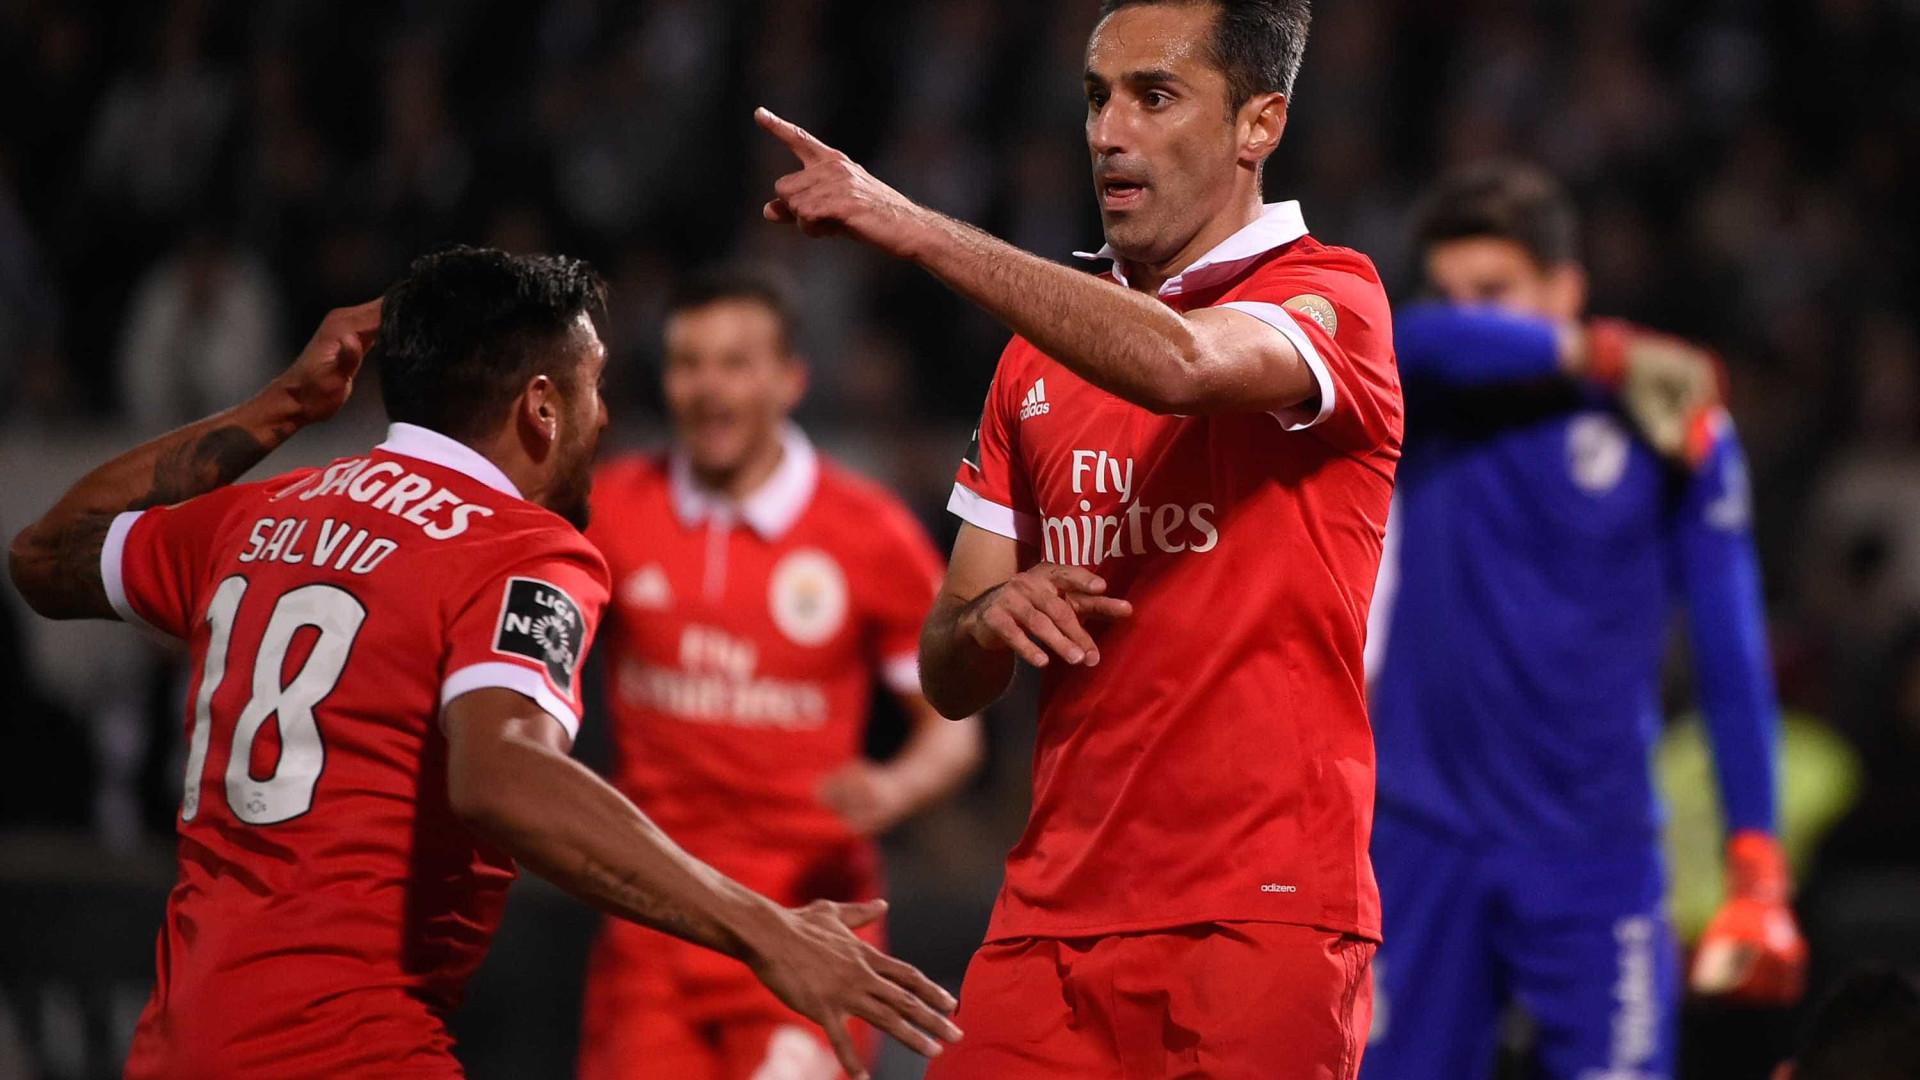 Jonas encerra novela, descarta interesse do Palmeiras e fica no Benfica